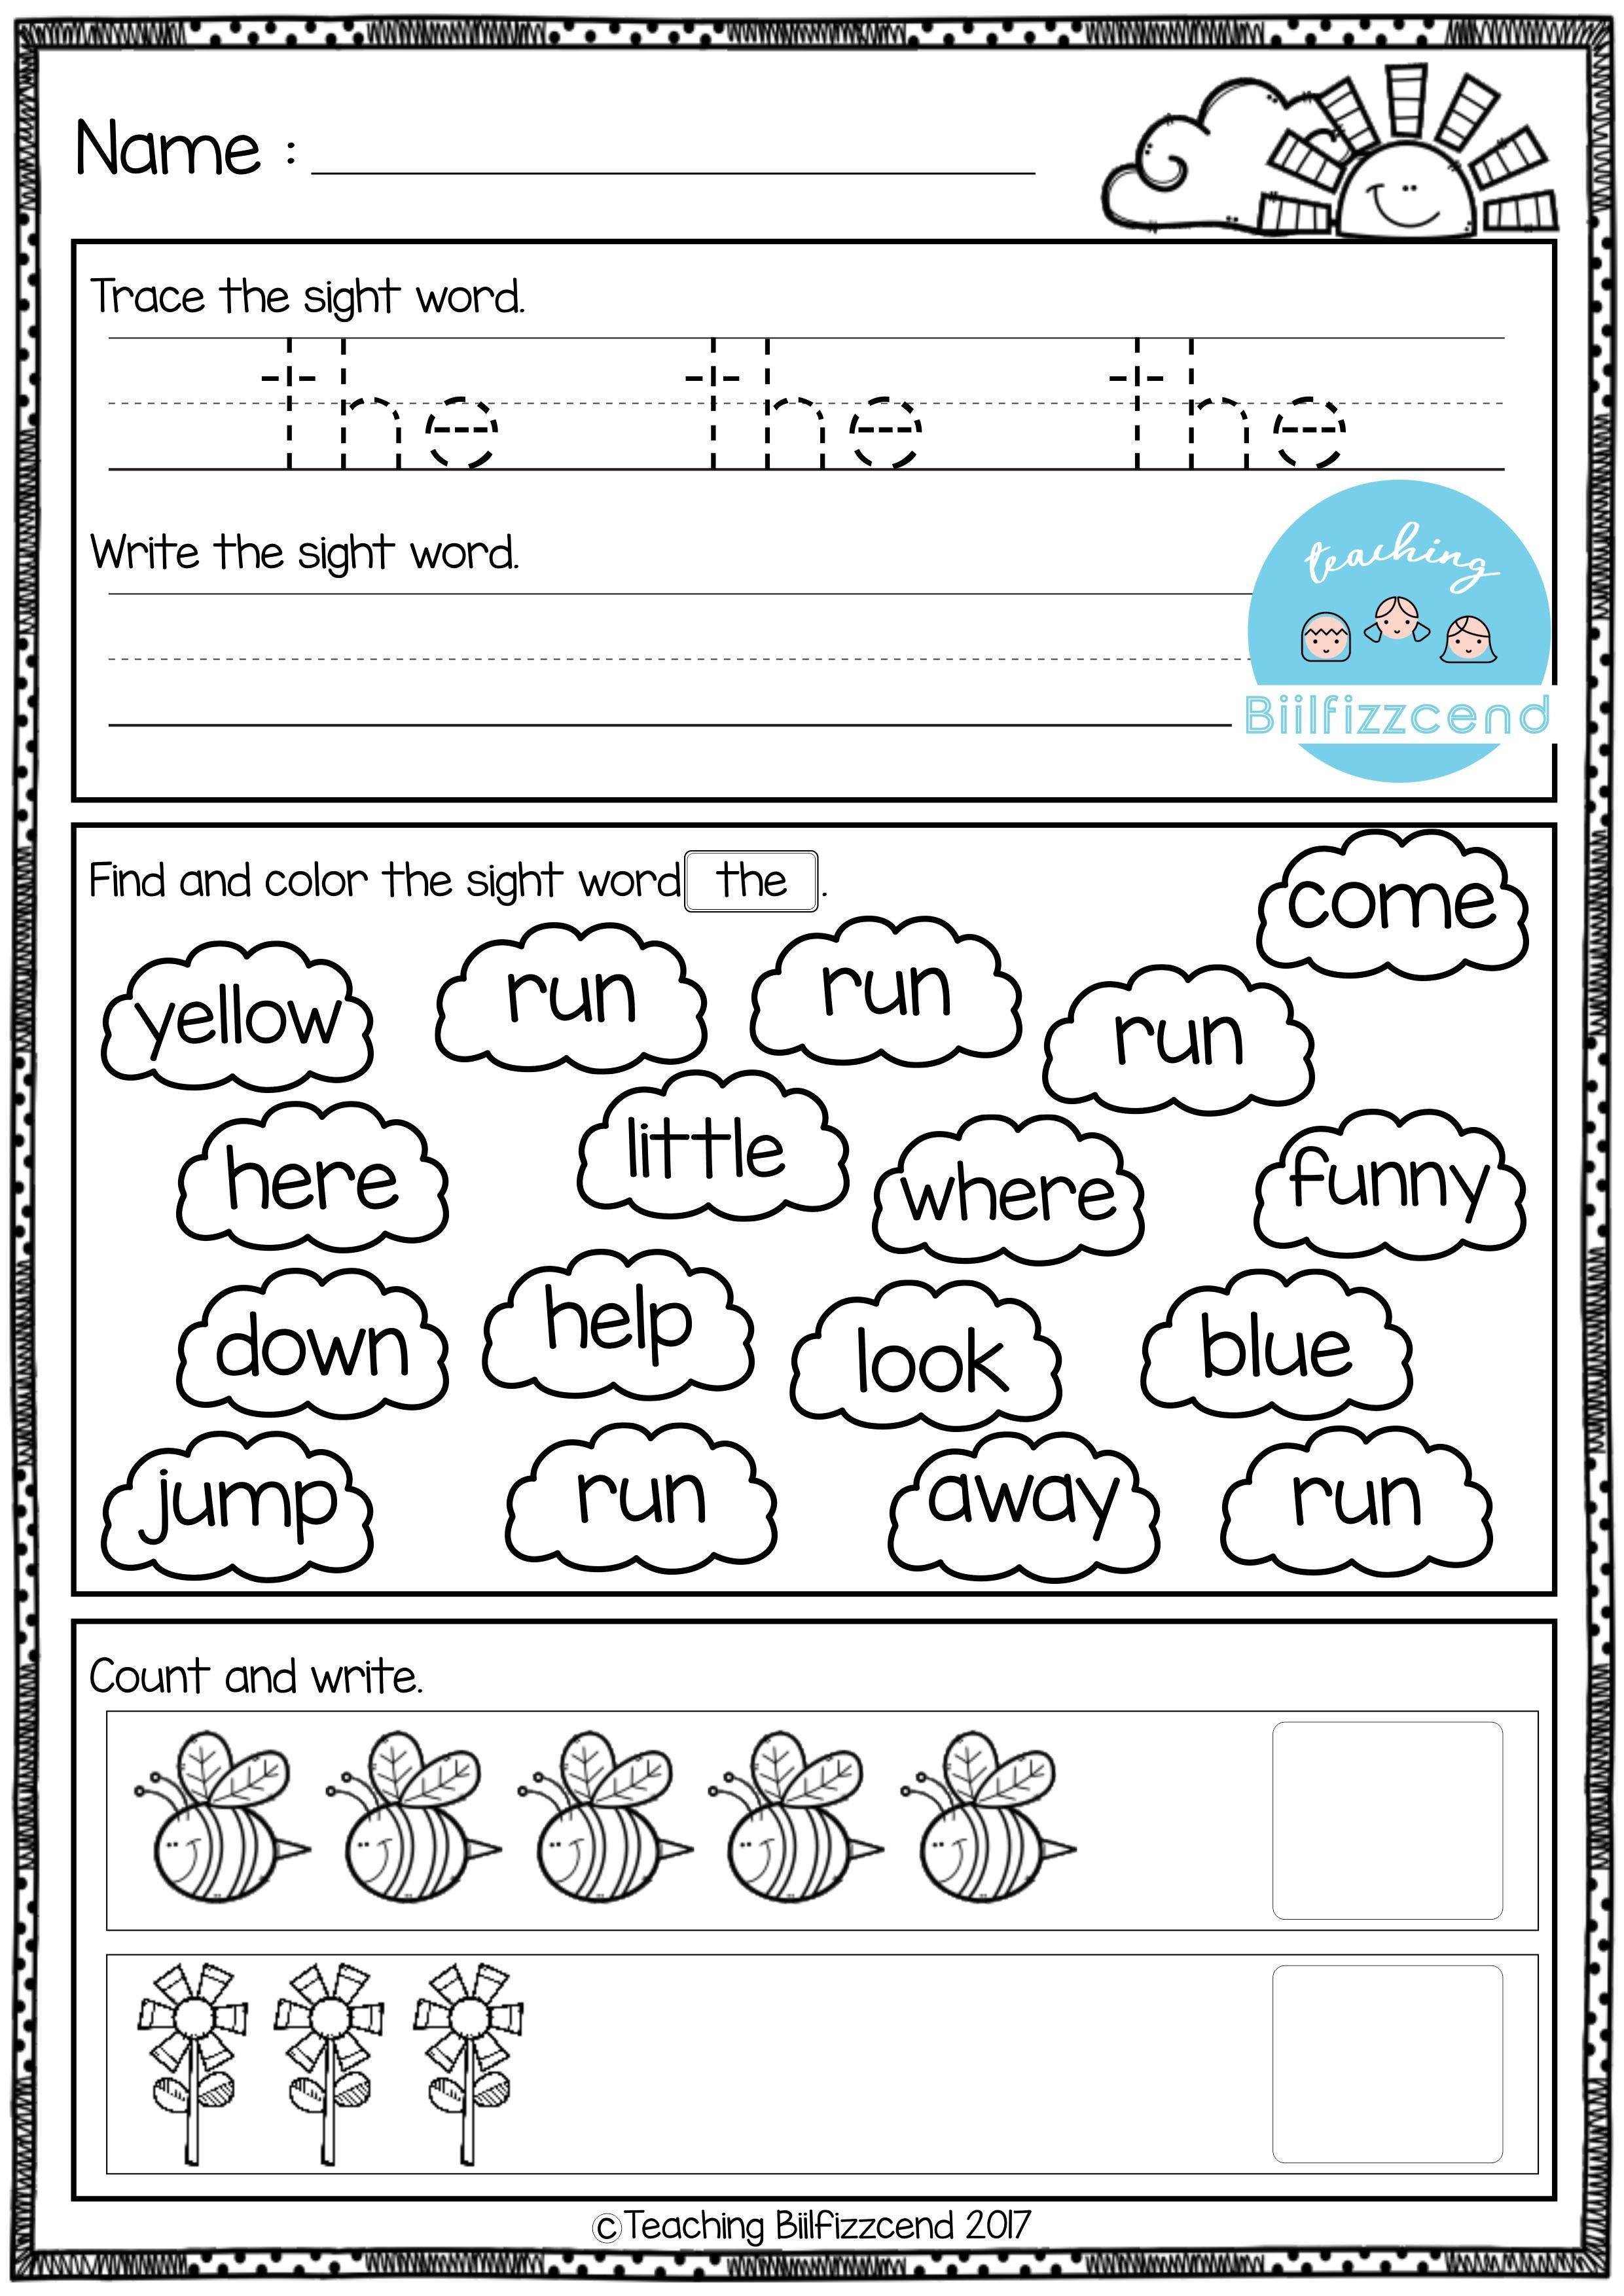 Free Kindergarten Morning Work Inside You Will Find 12 Pages Free Kinder Kindergarten Morning Work Free Kindergarten Worksheets Morning Work Kindergarten Free [ 3508 x 2481 Pixel ]